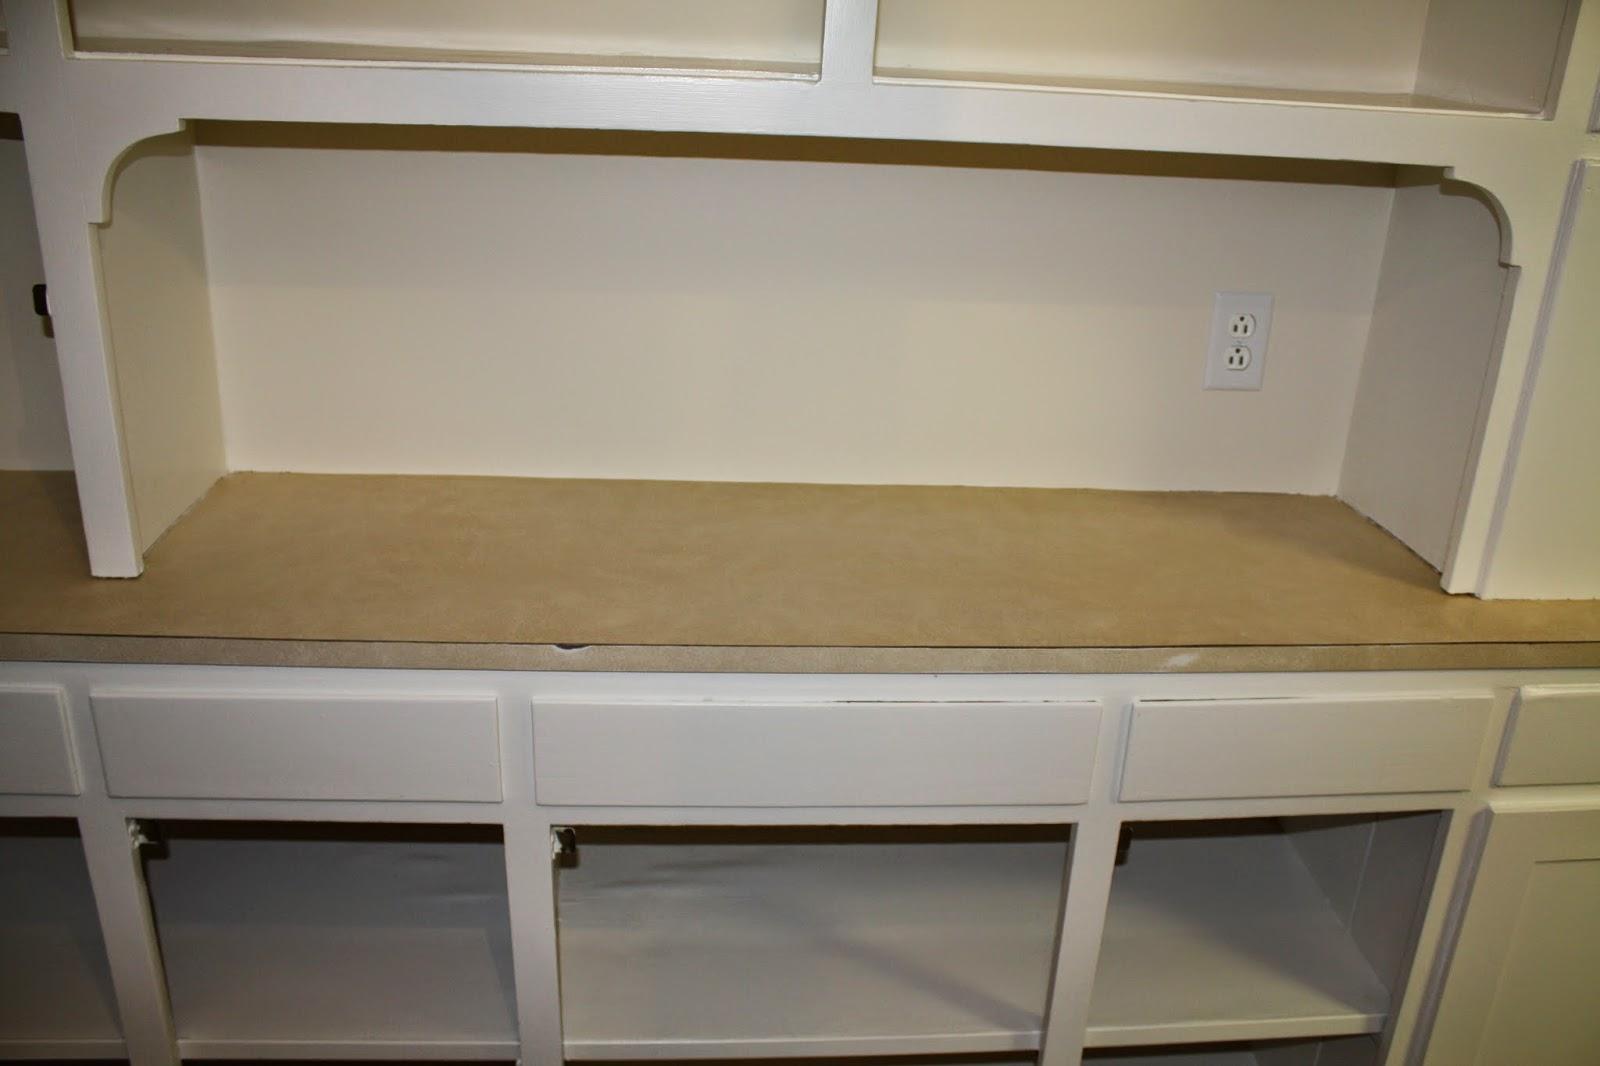 Converting laminate counters to oak